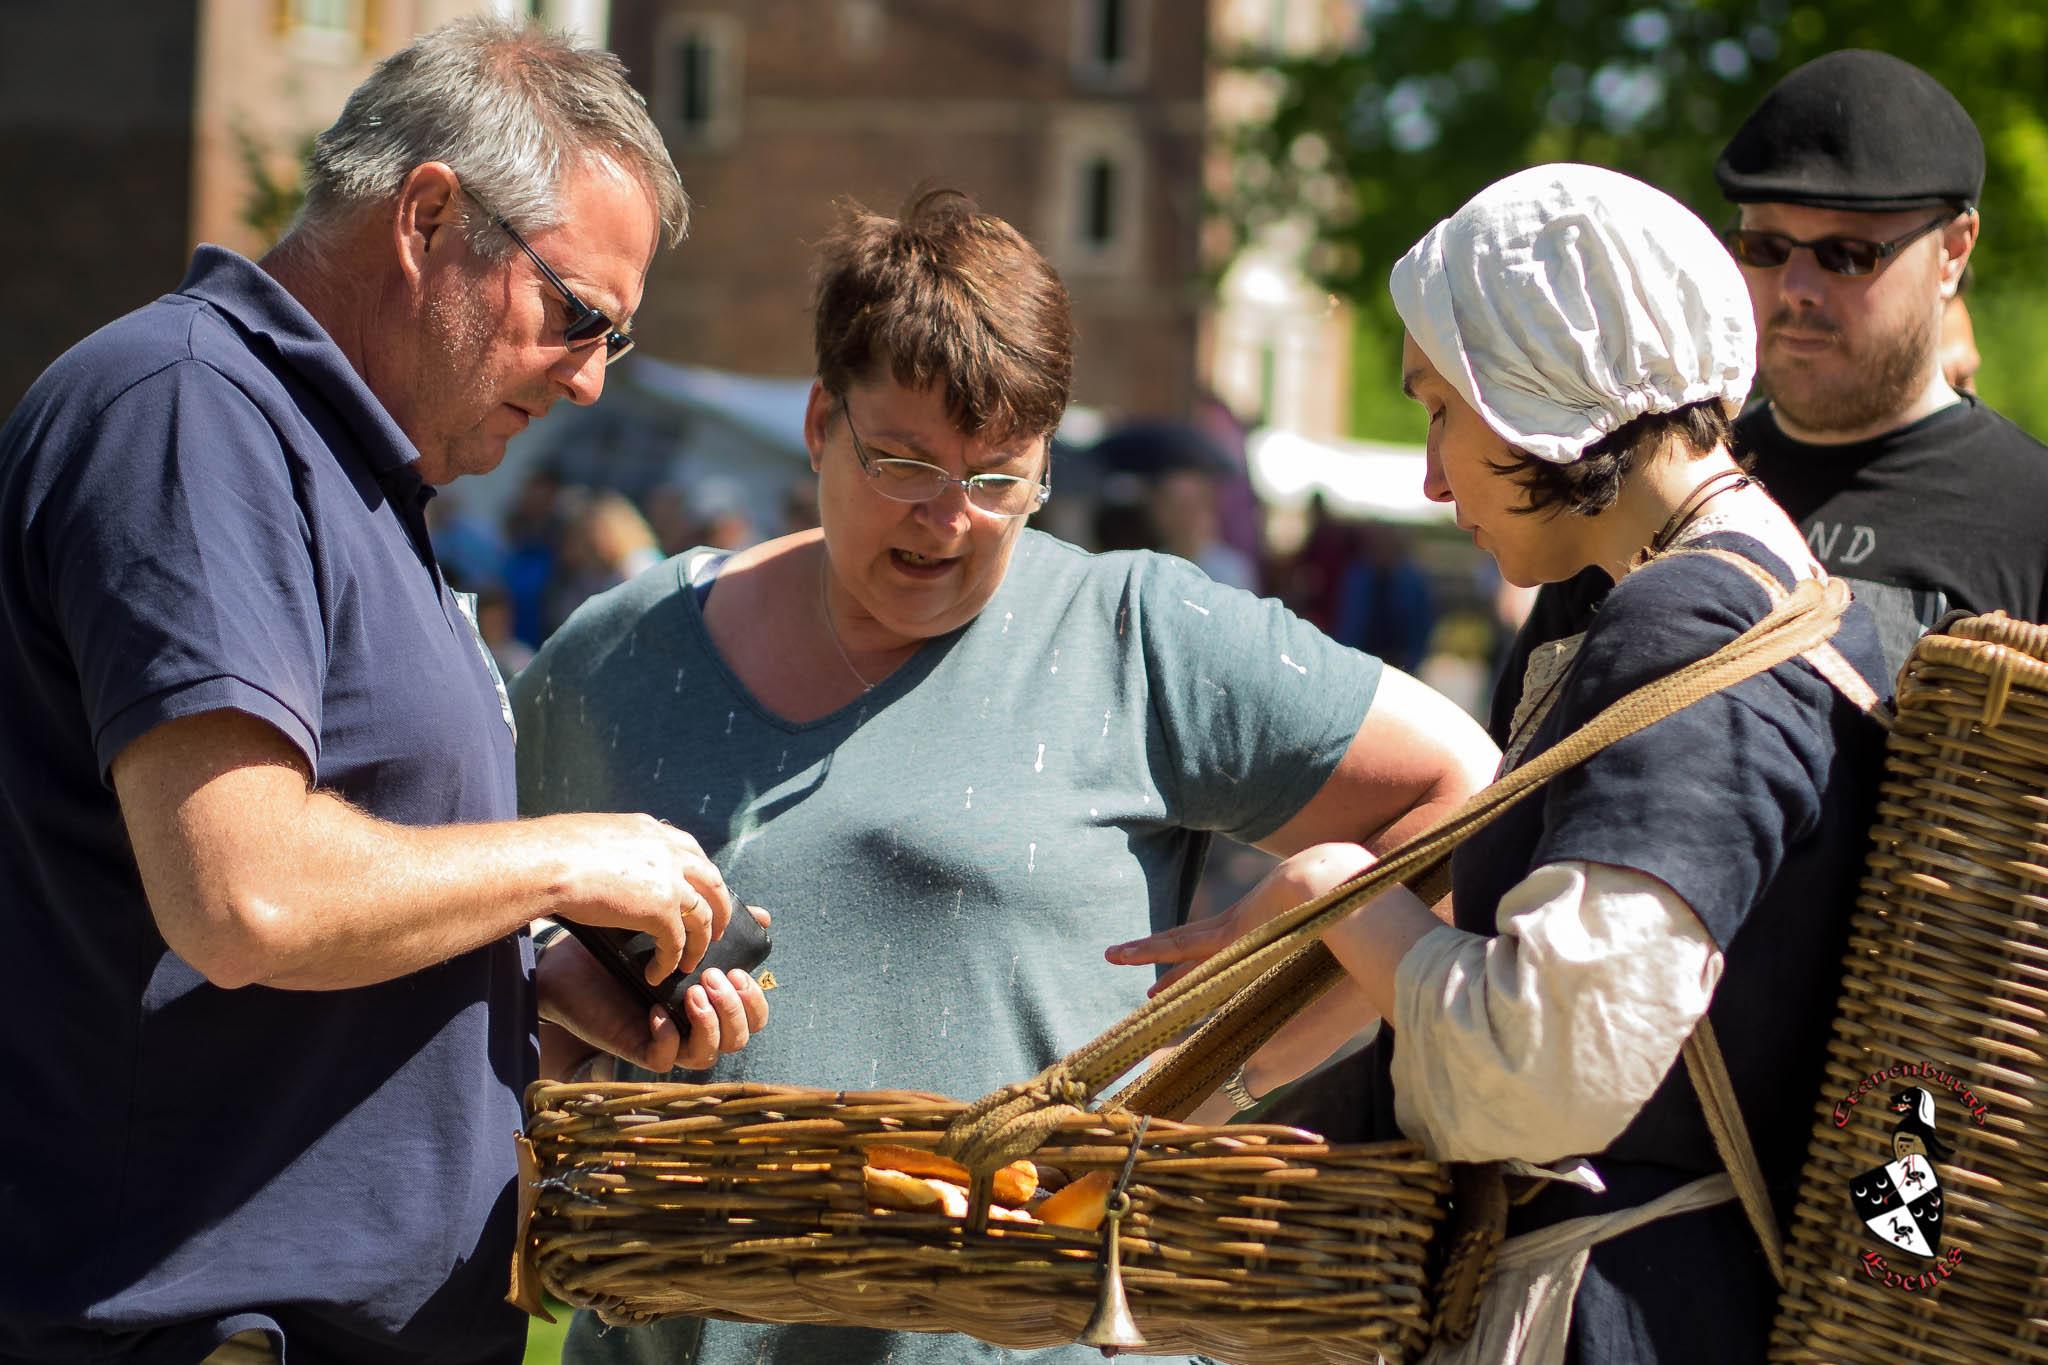 Middeleeuws-Festijn-Cannenburgh-2018-Algemeen-Ellen-la-Faille-7